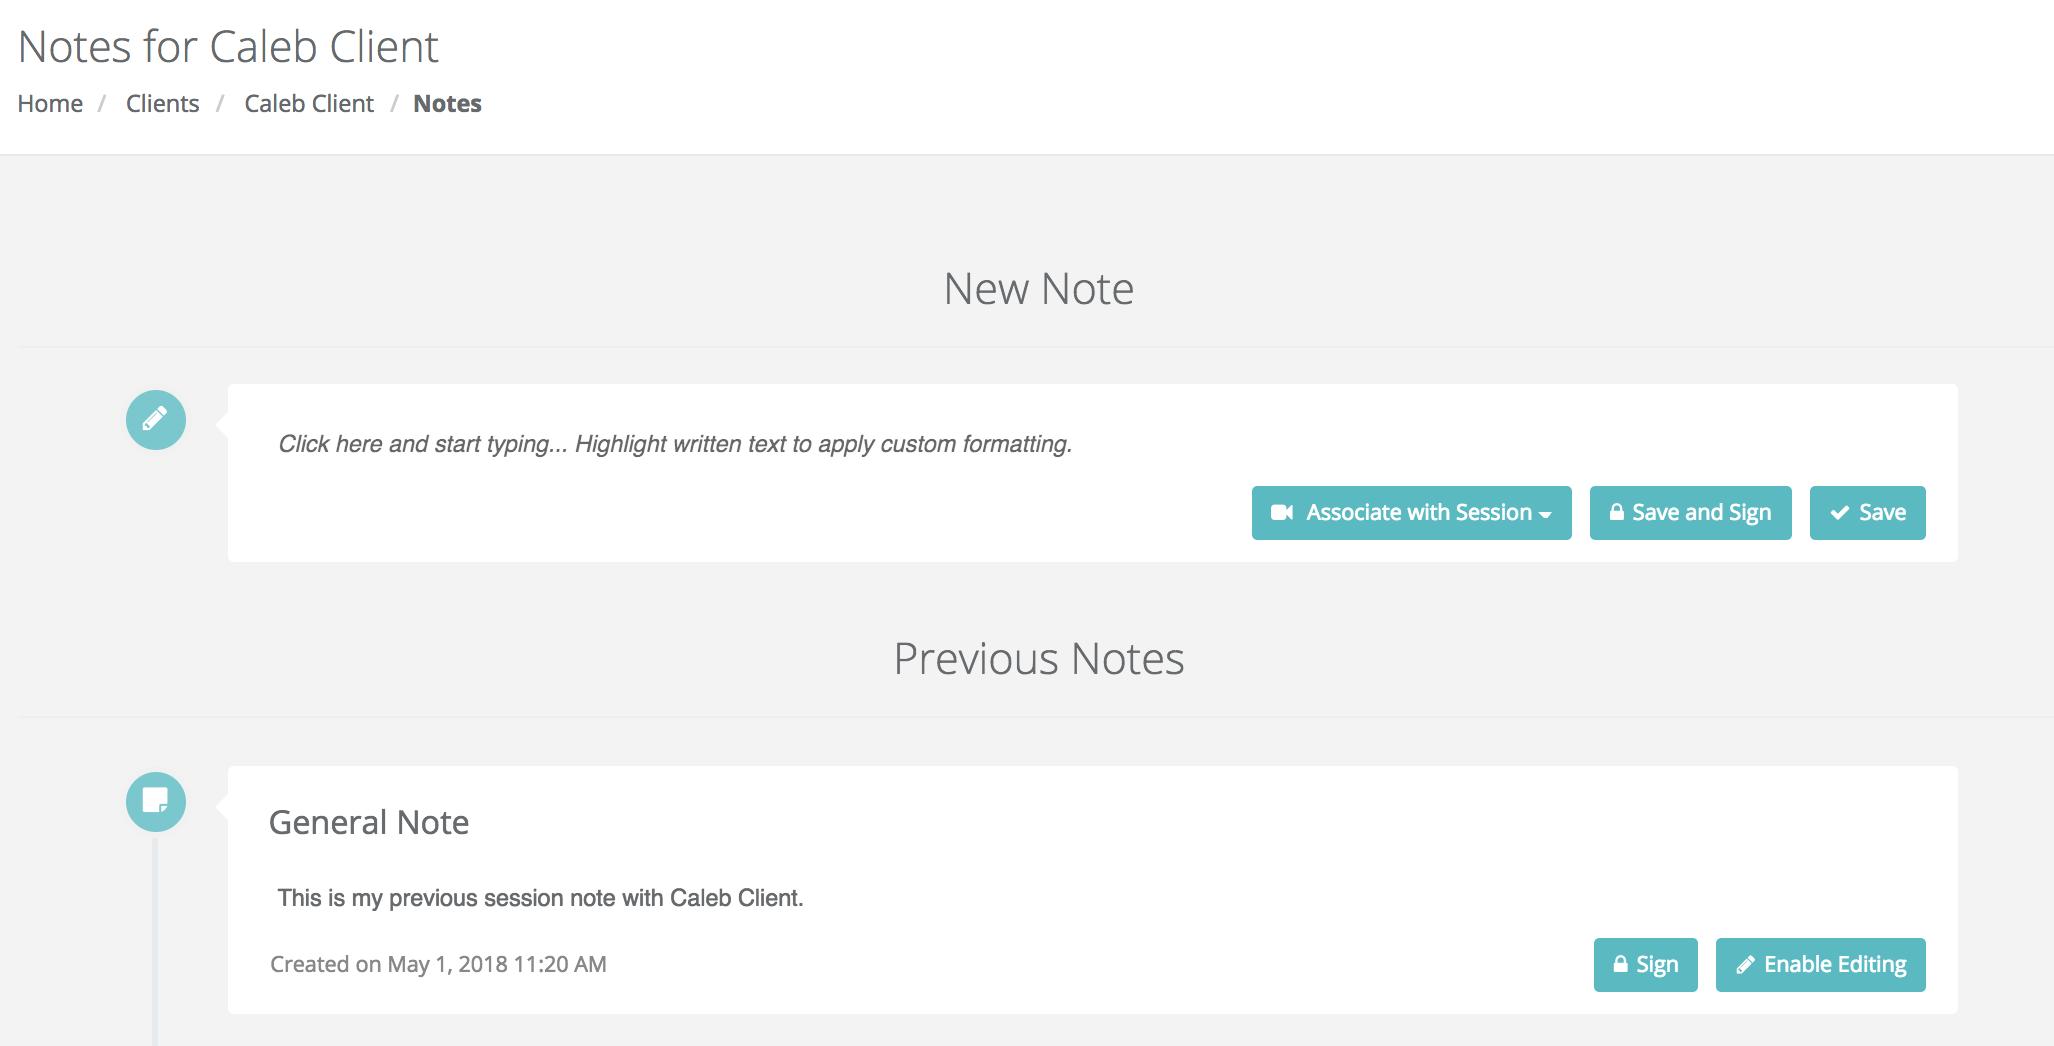 Notes screen